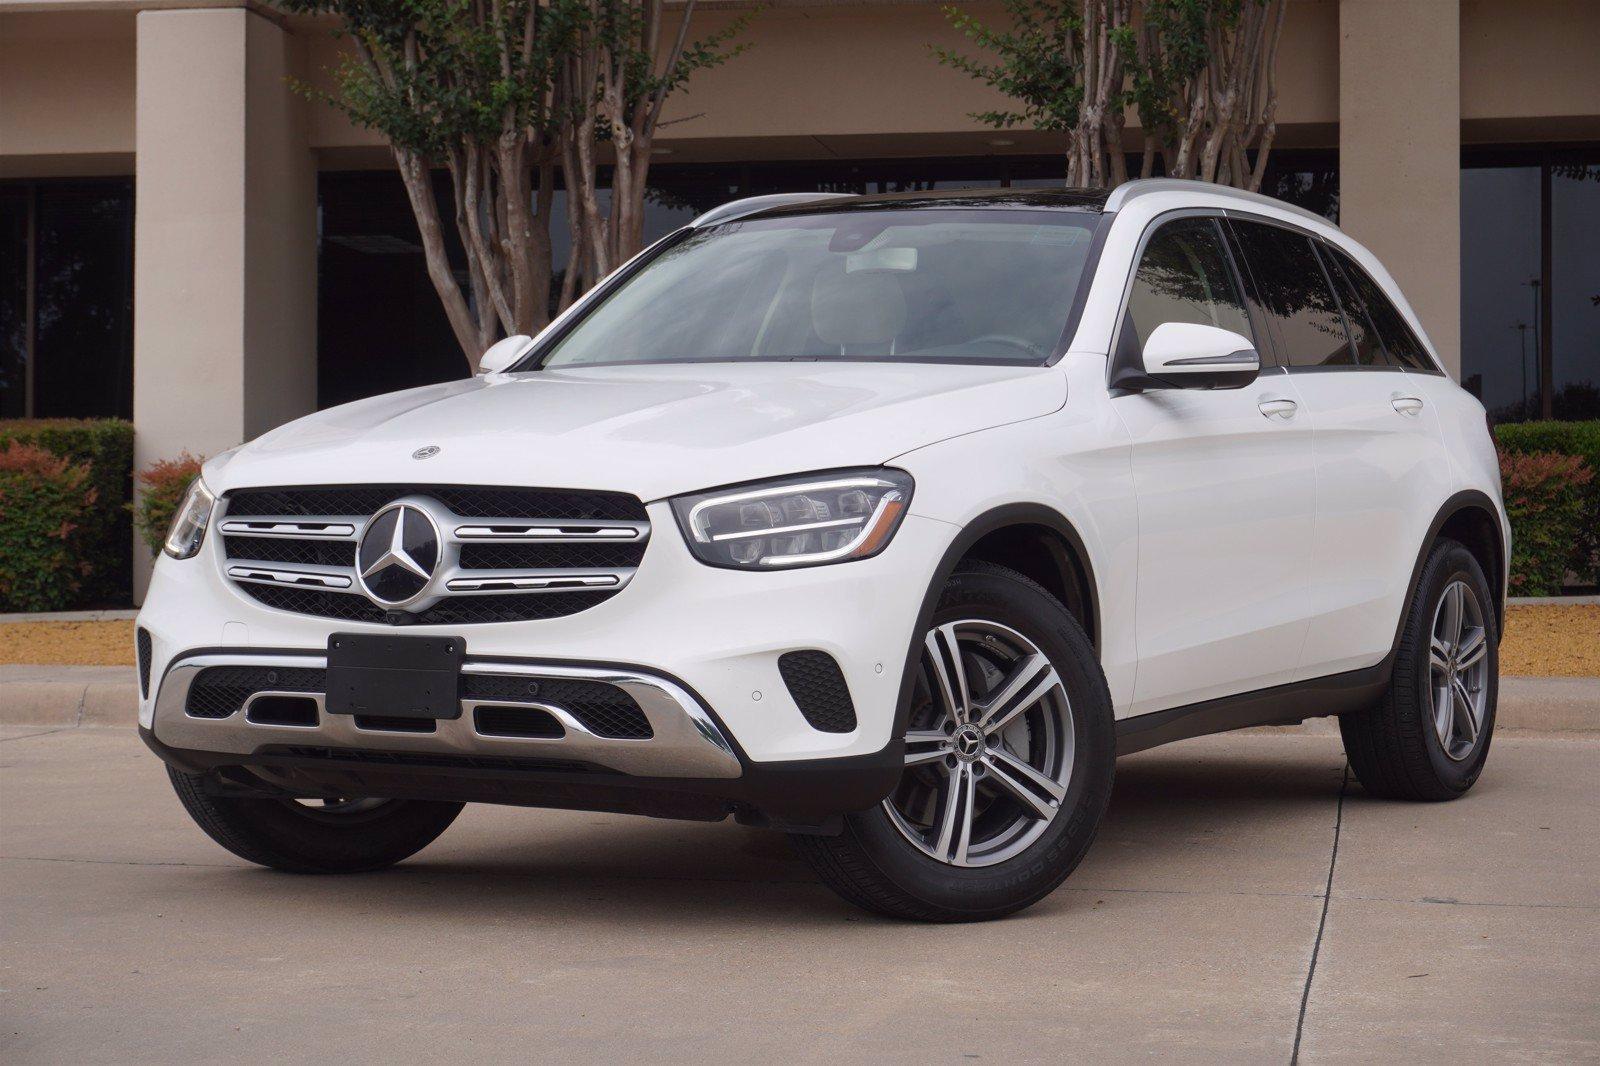 2020 Mercedes-Benz GLC Vehicle Photo in Grapevine, TX 76051